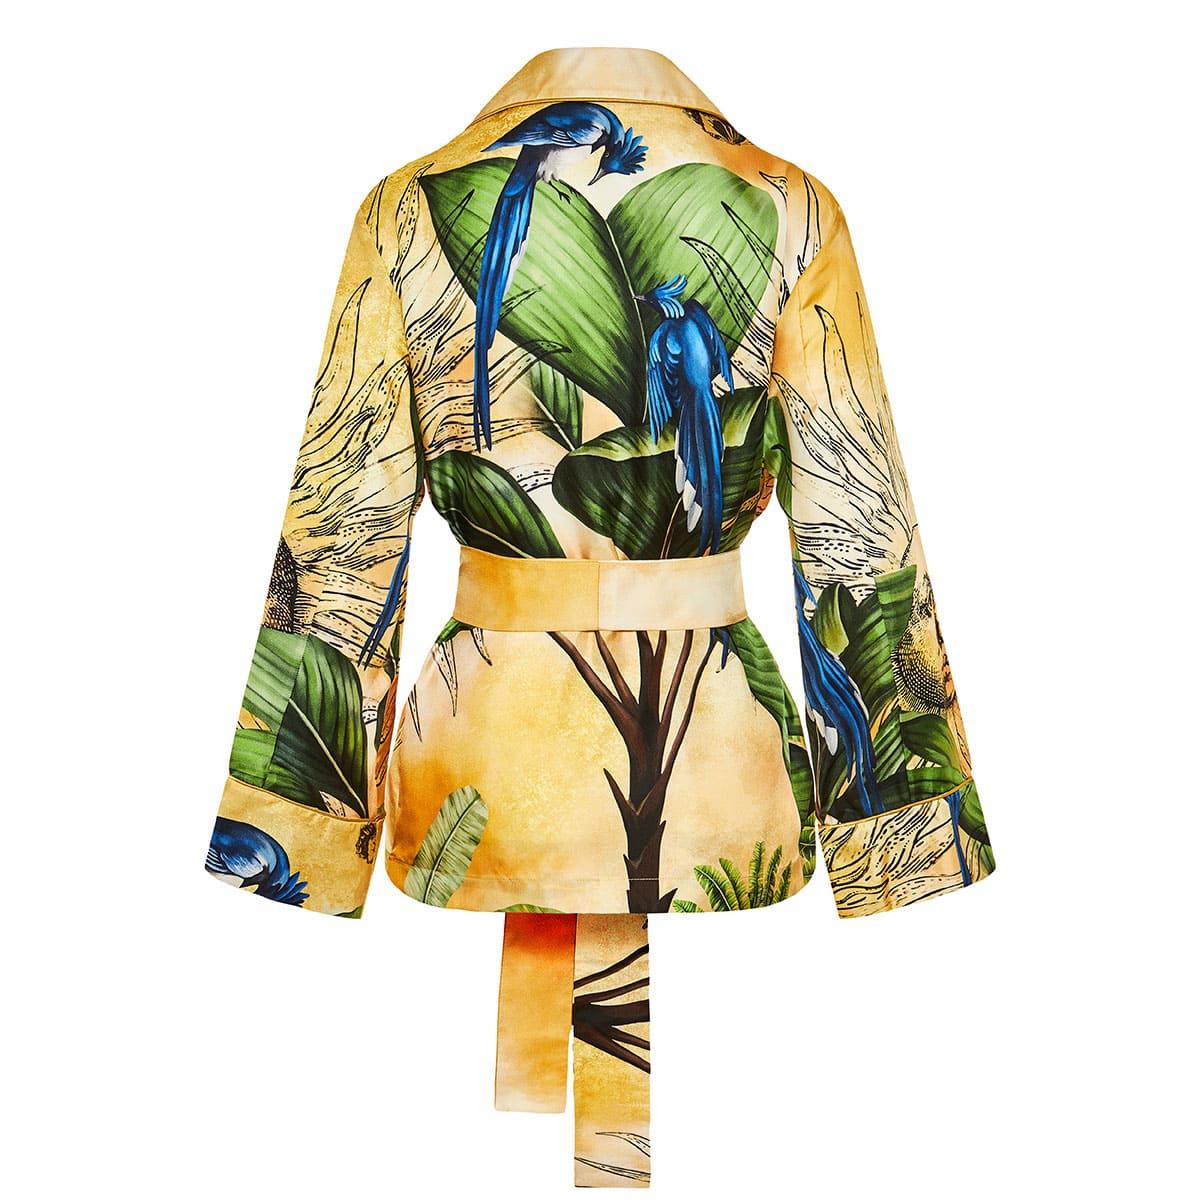 Giocasta printed robe shirt